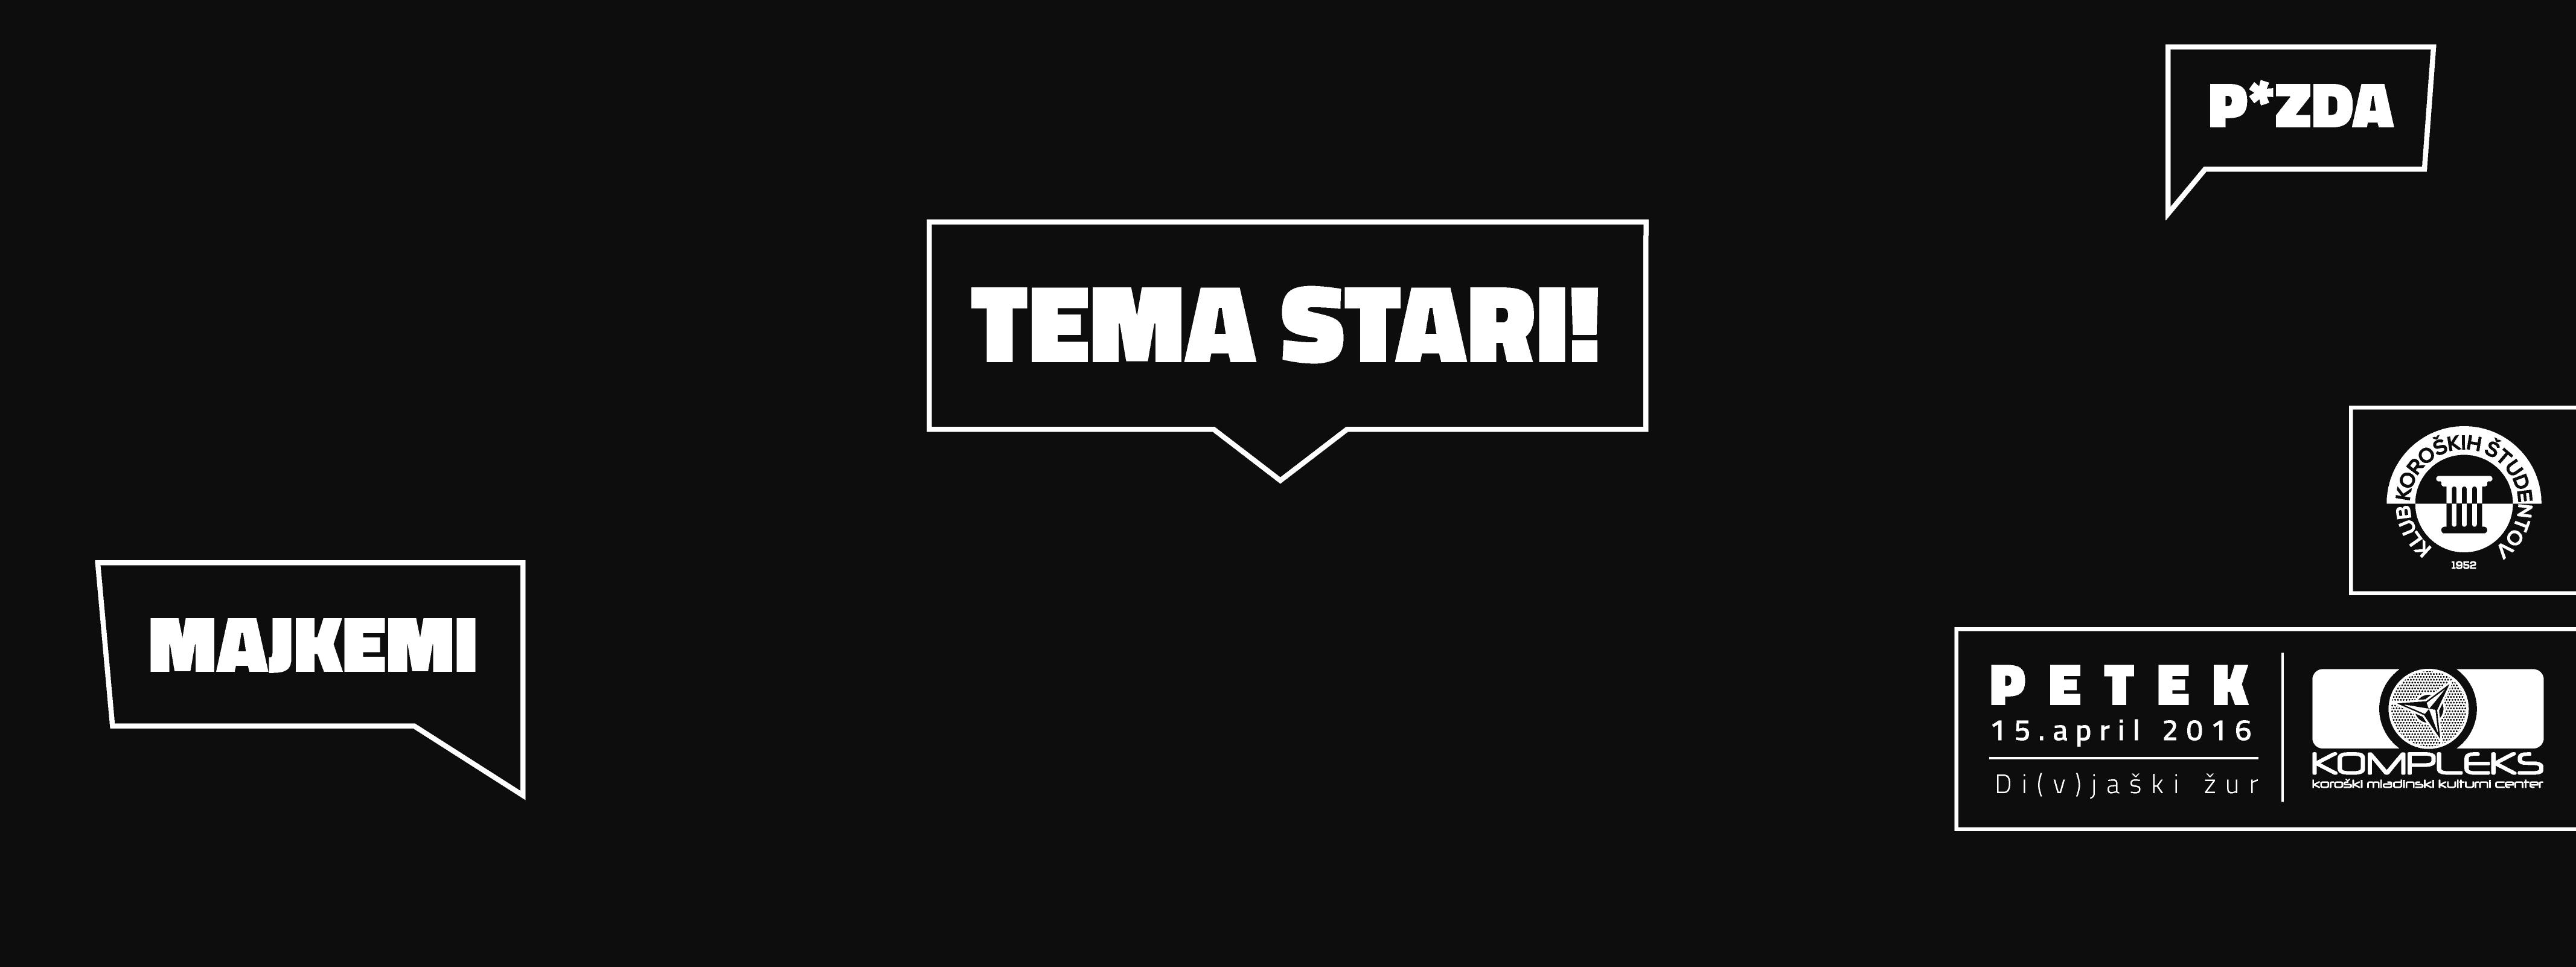 TEMA STARI divjaski zur-01